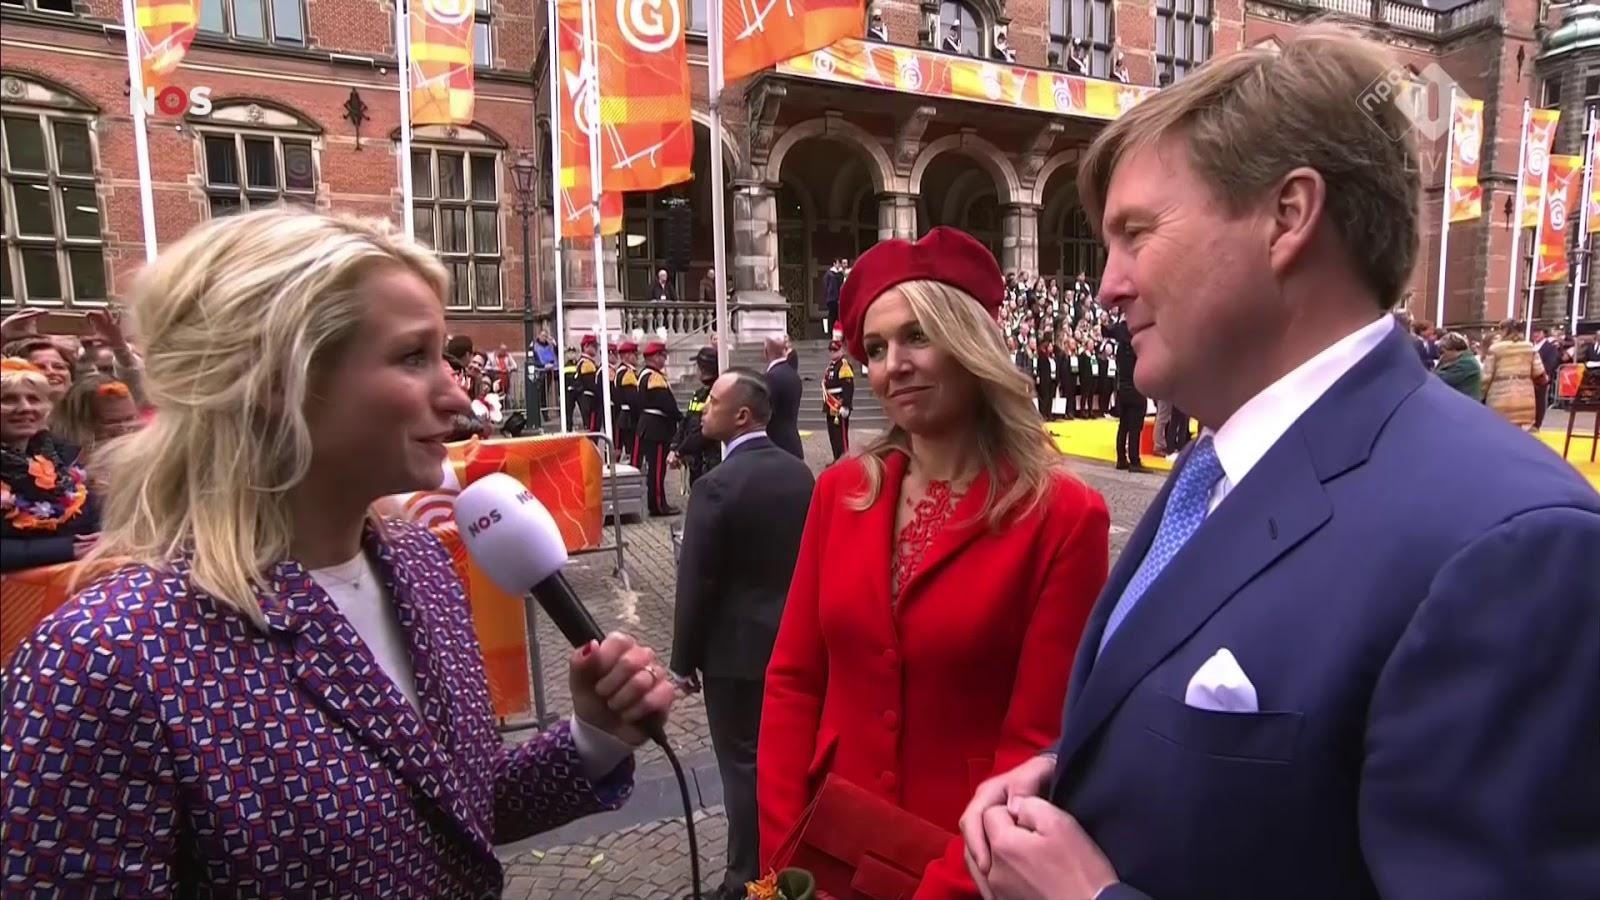 Dionne Stax Dionne Stax Nos Koningsdag 2018 In Groningen